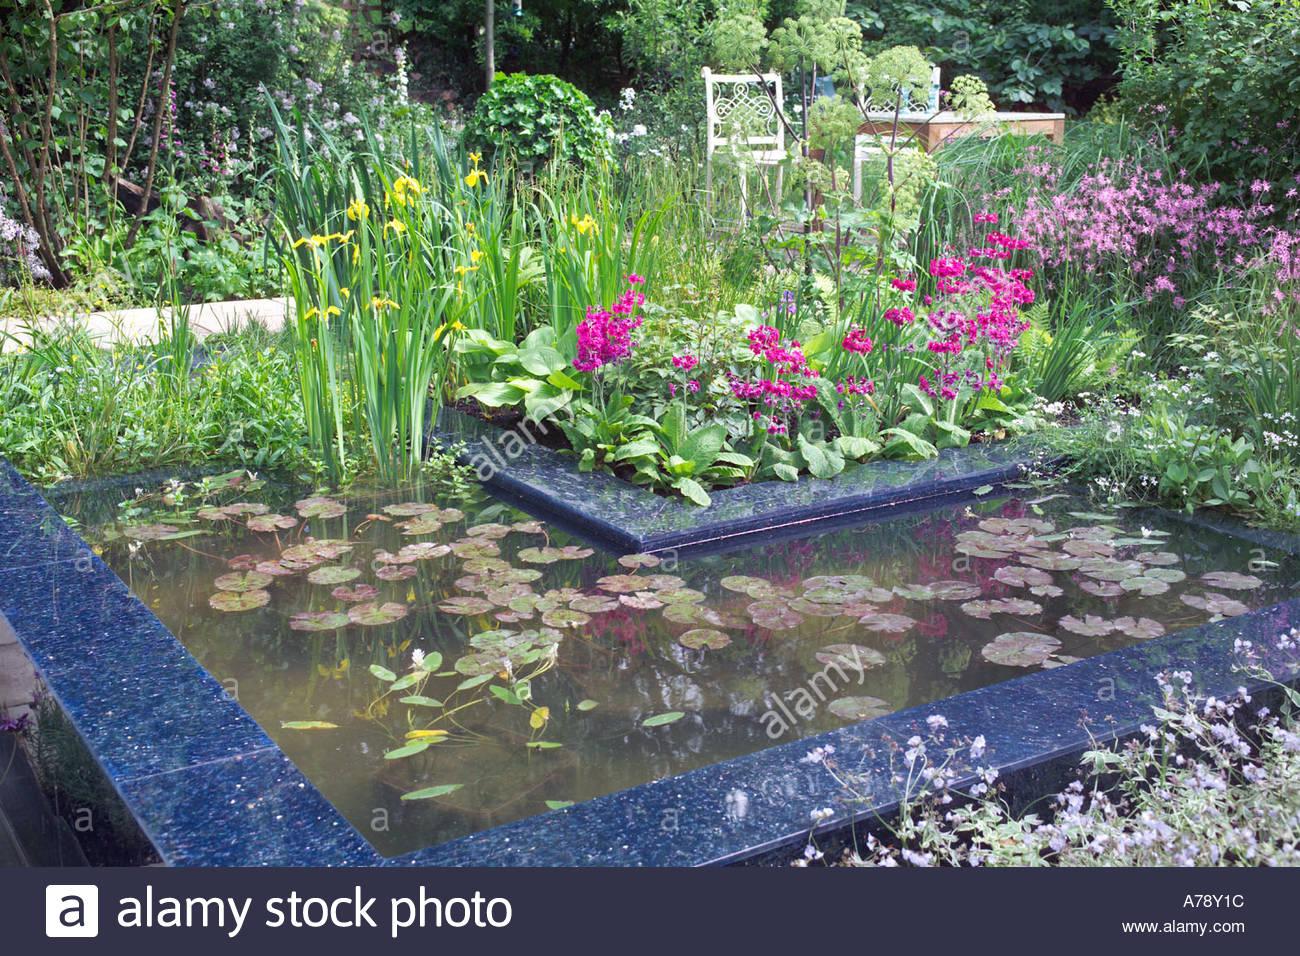 Wildlife friendly garden with pond aquatic plants for Pond friendly plants